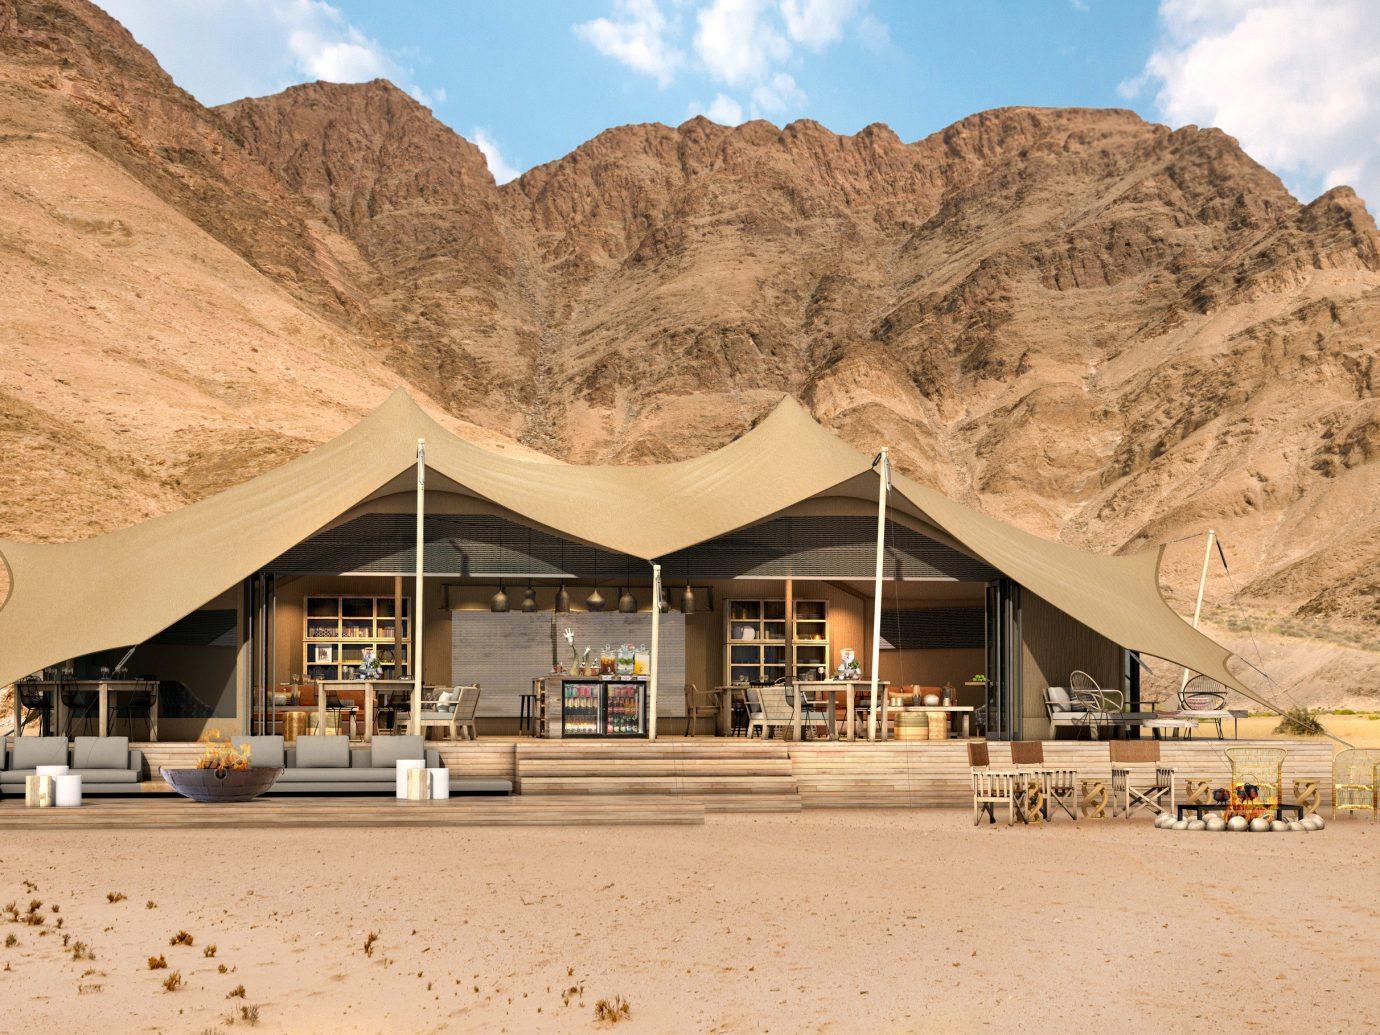 africa Honeymoon Namibia Romance Trip Ideas landscape sand aeolian landform sky home mountain real estate elevation tourism vacation